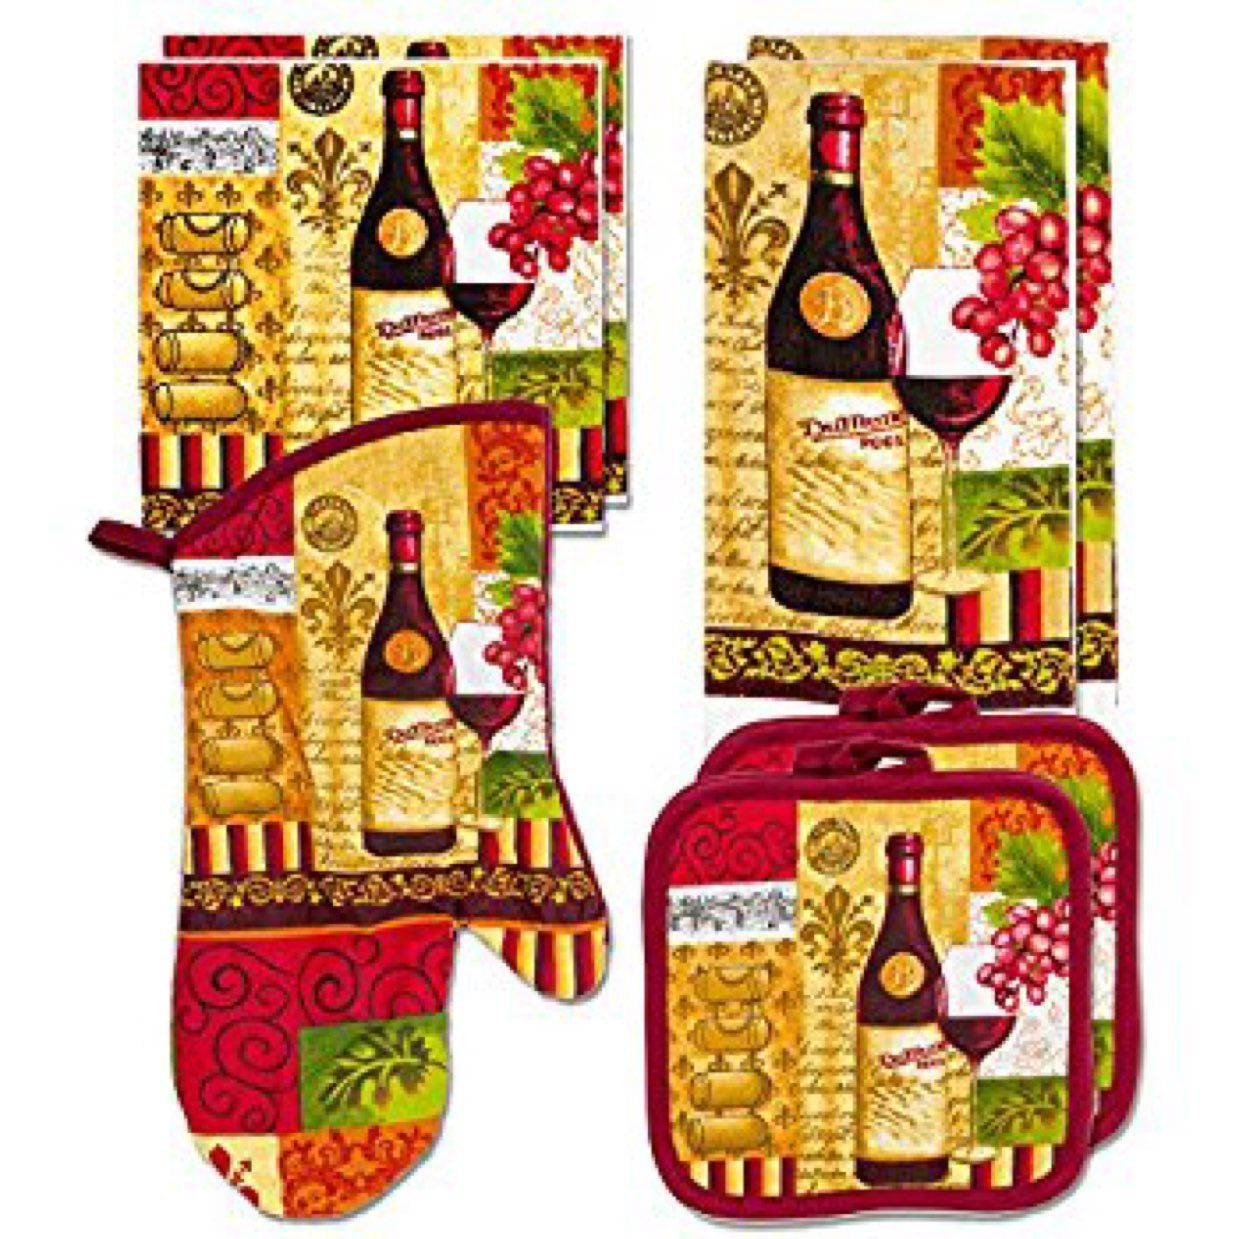 Wine Kitchen Bundle New - Mercari: Anyone can buy & sell